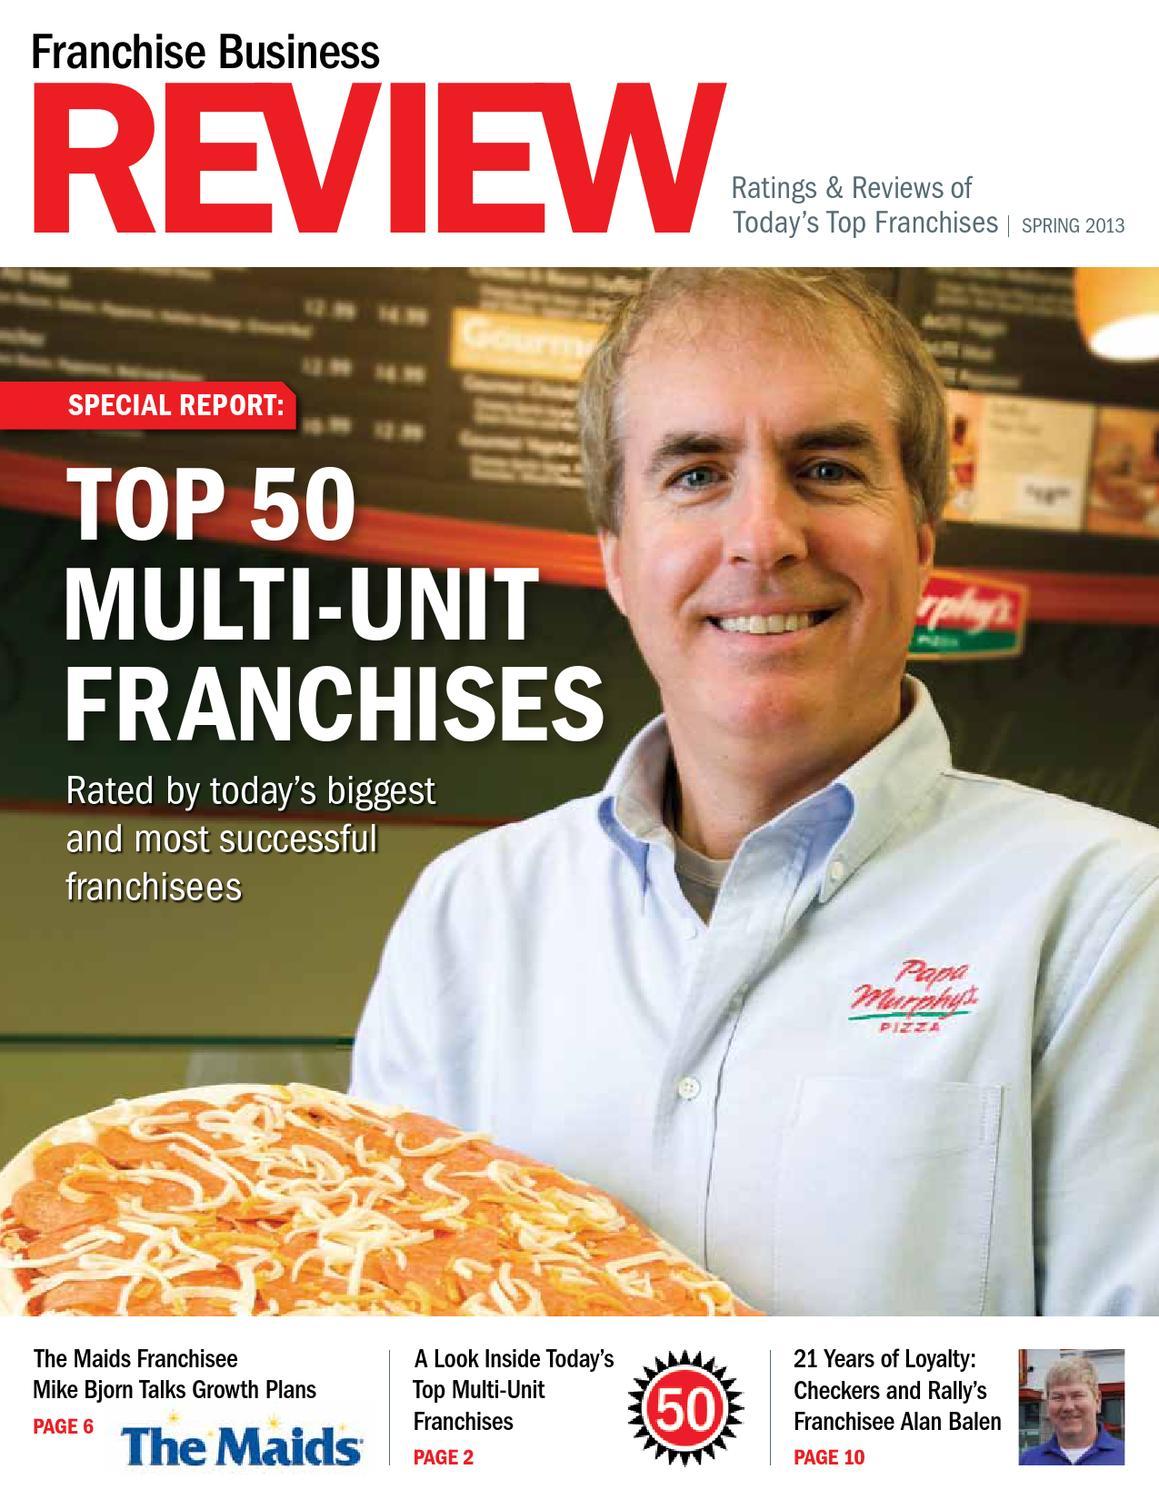 Top 50 Multiunit Franchises By Franchise Business Review